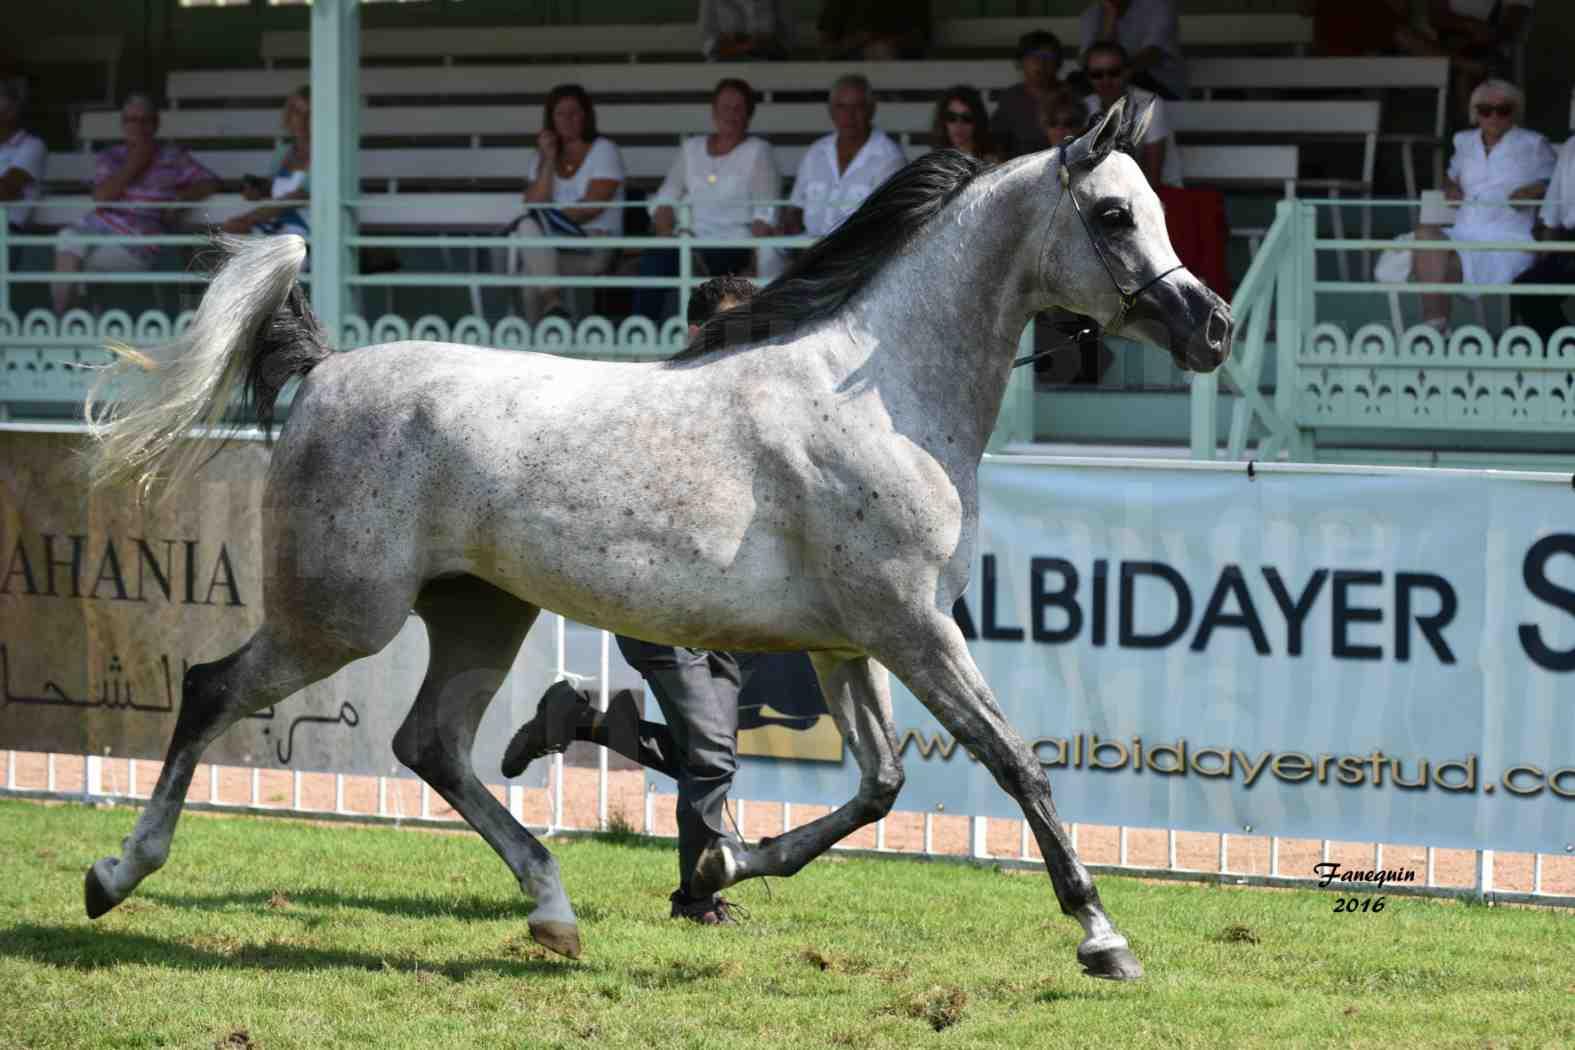 International Arabian Horse Show B de VICHY 2016 - ISABELLA - Notre Sélection - 05